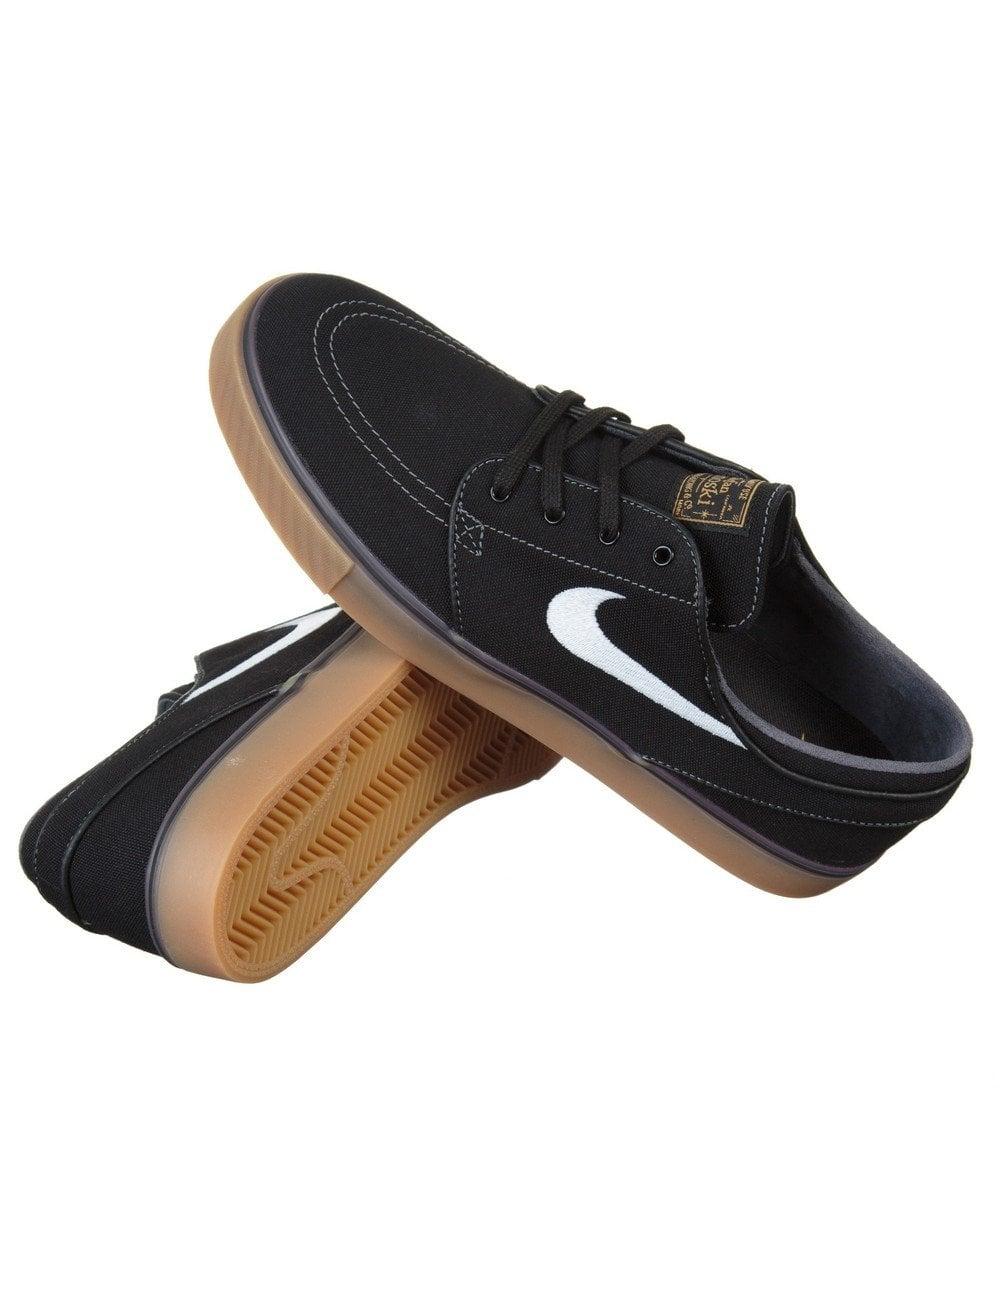 Adidas Shoes Urban Dictionary